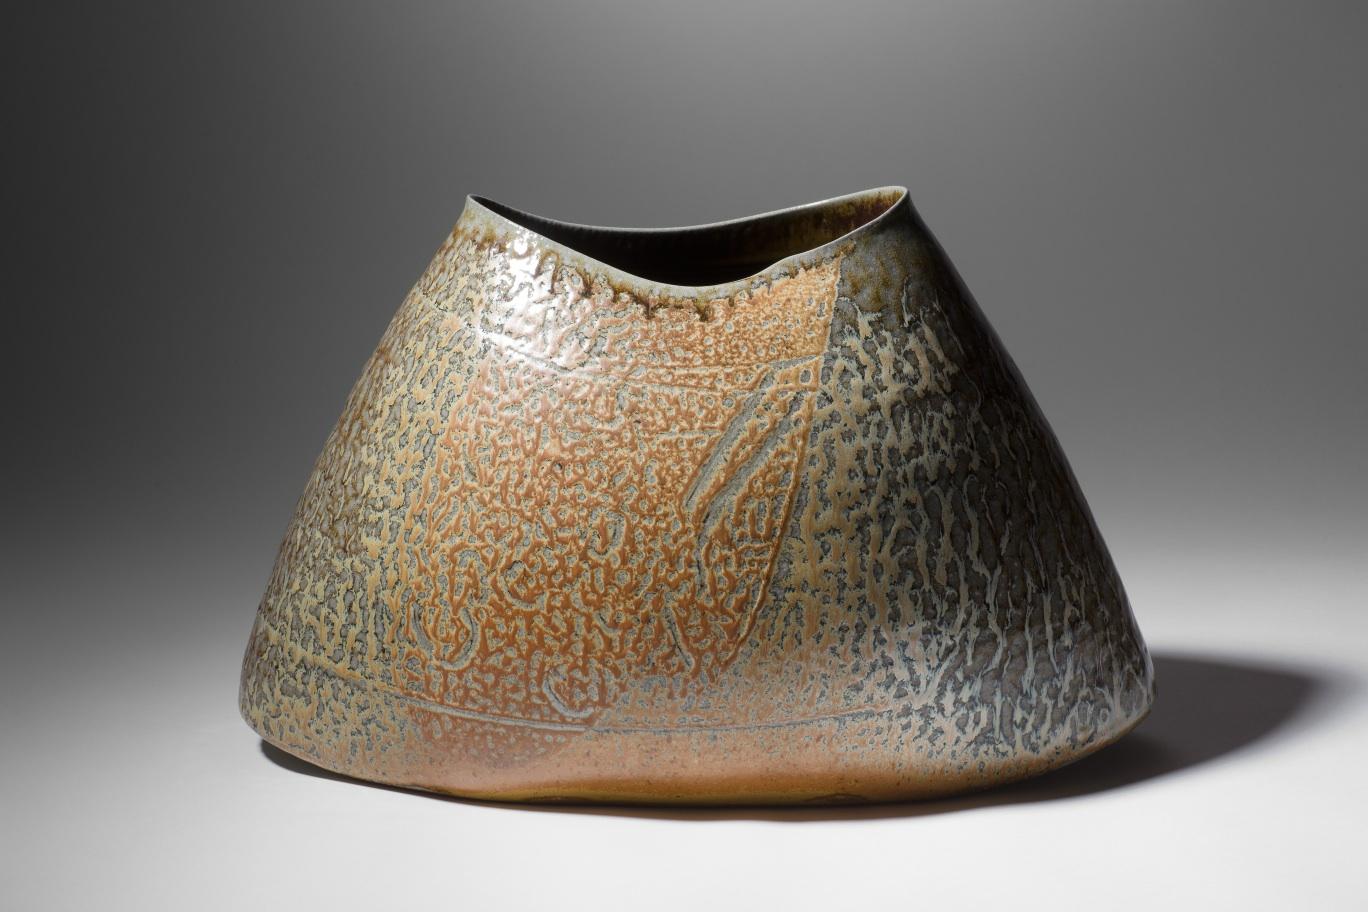 Mandy Parslow, MP02 Elliptical Vessel, wood fired salt glazed stoneware, 27 x 43 x 22cm, EUR 1000